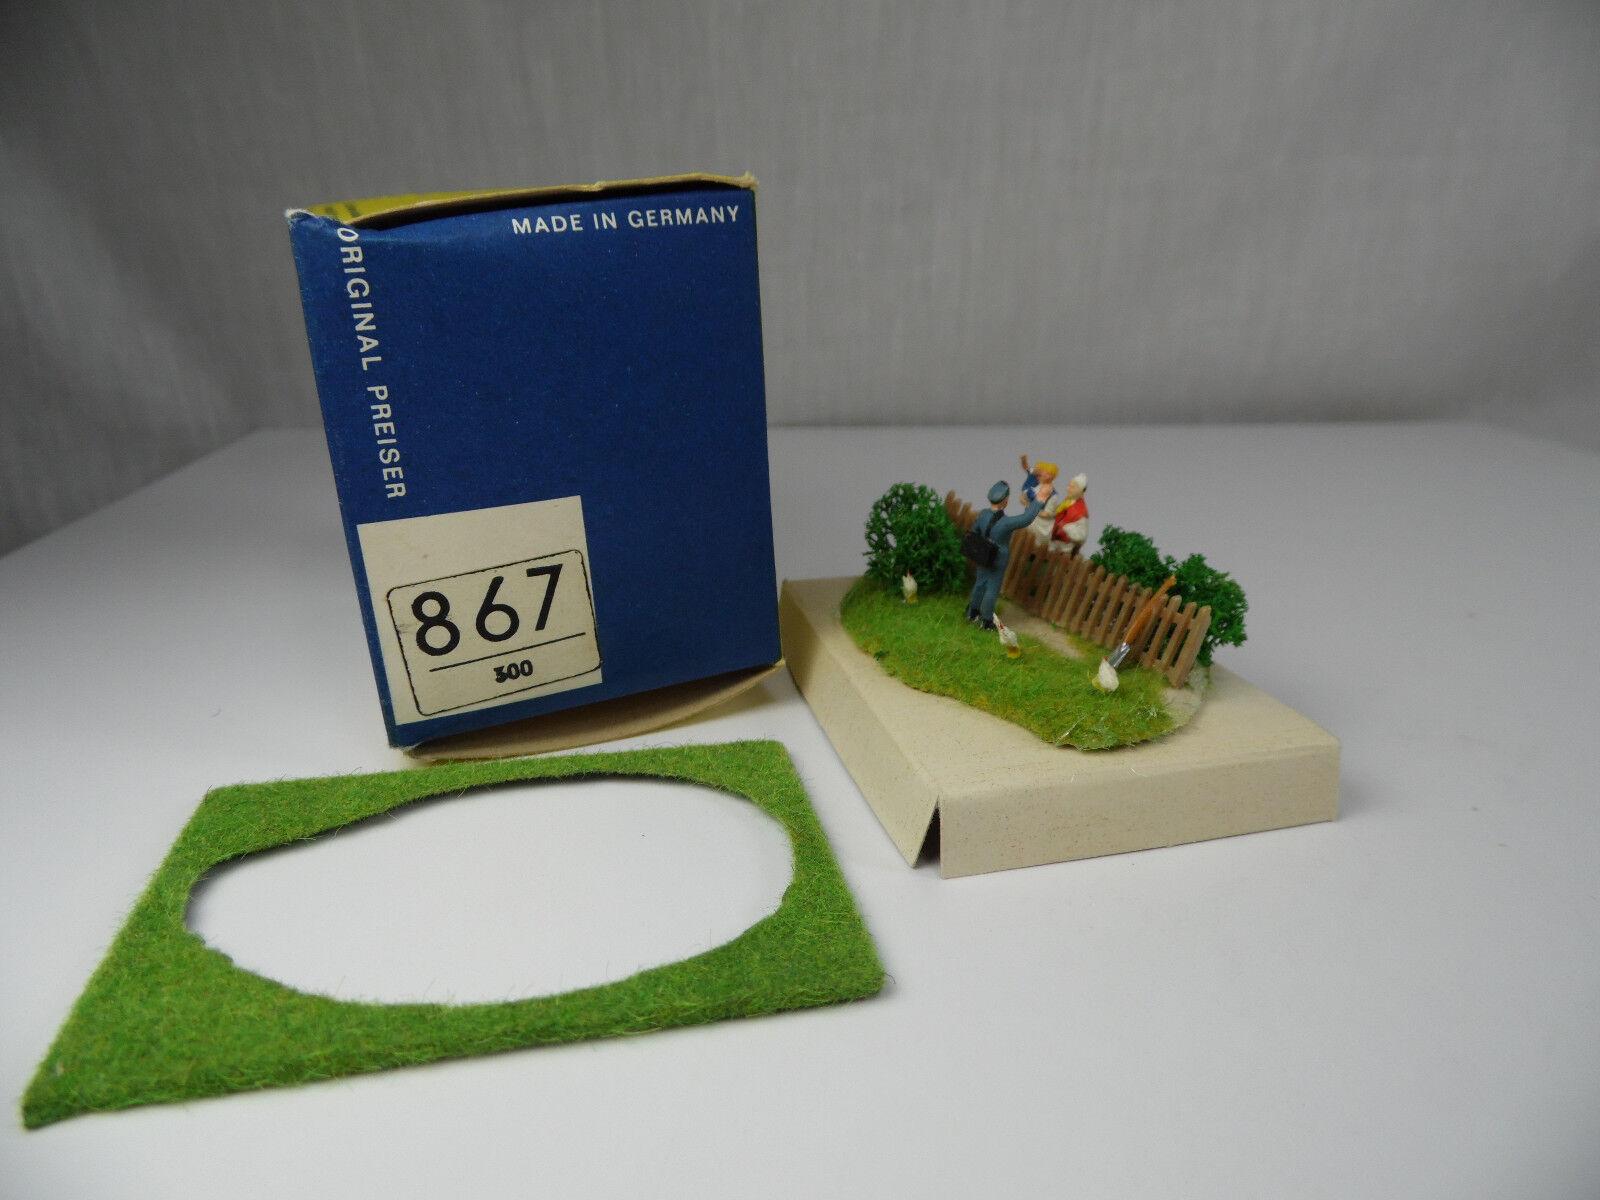 H1206, rar preiser 867 pequeño dioramas con figuras box 1 87 h0 ALT